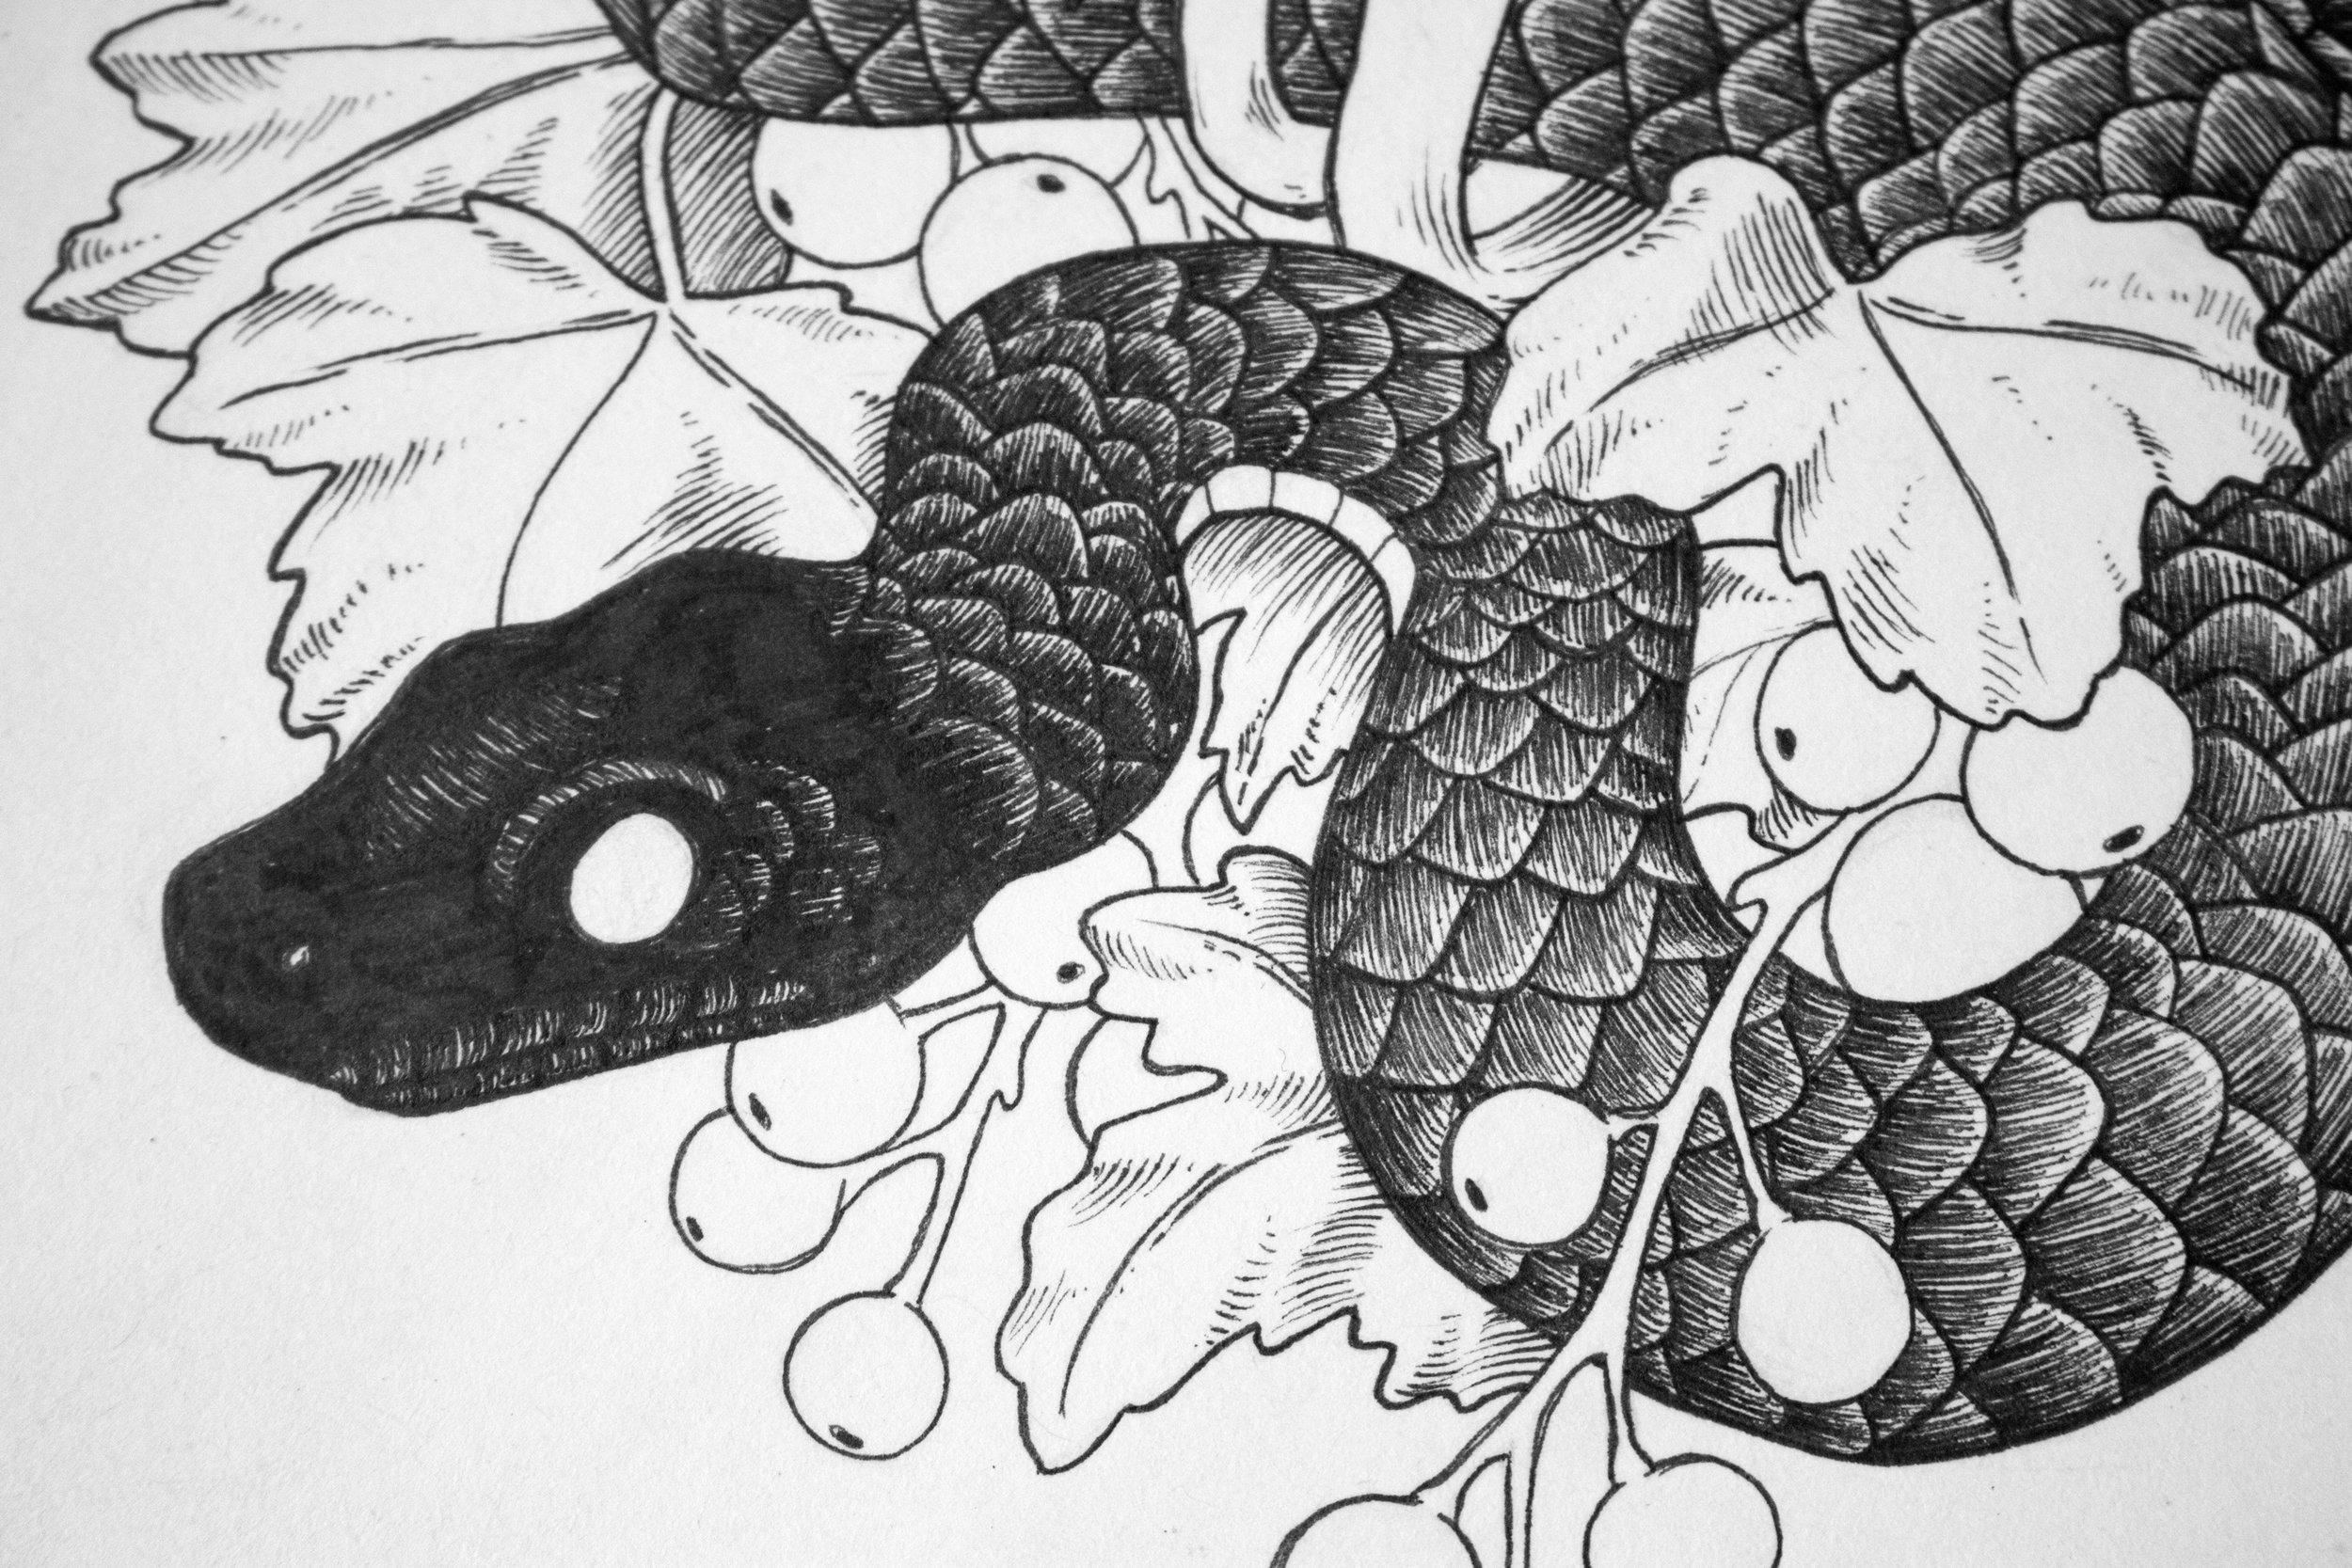 Jenn Sneary Illustration, Resurrect, Pen and Ink snake drawings